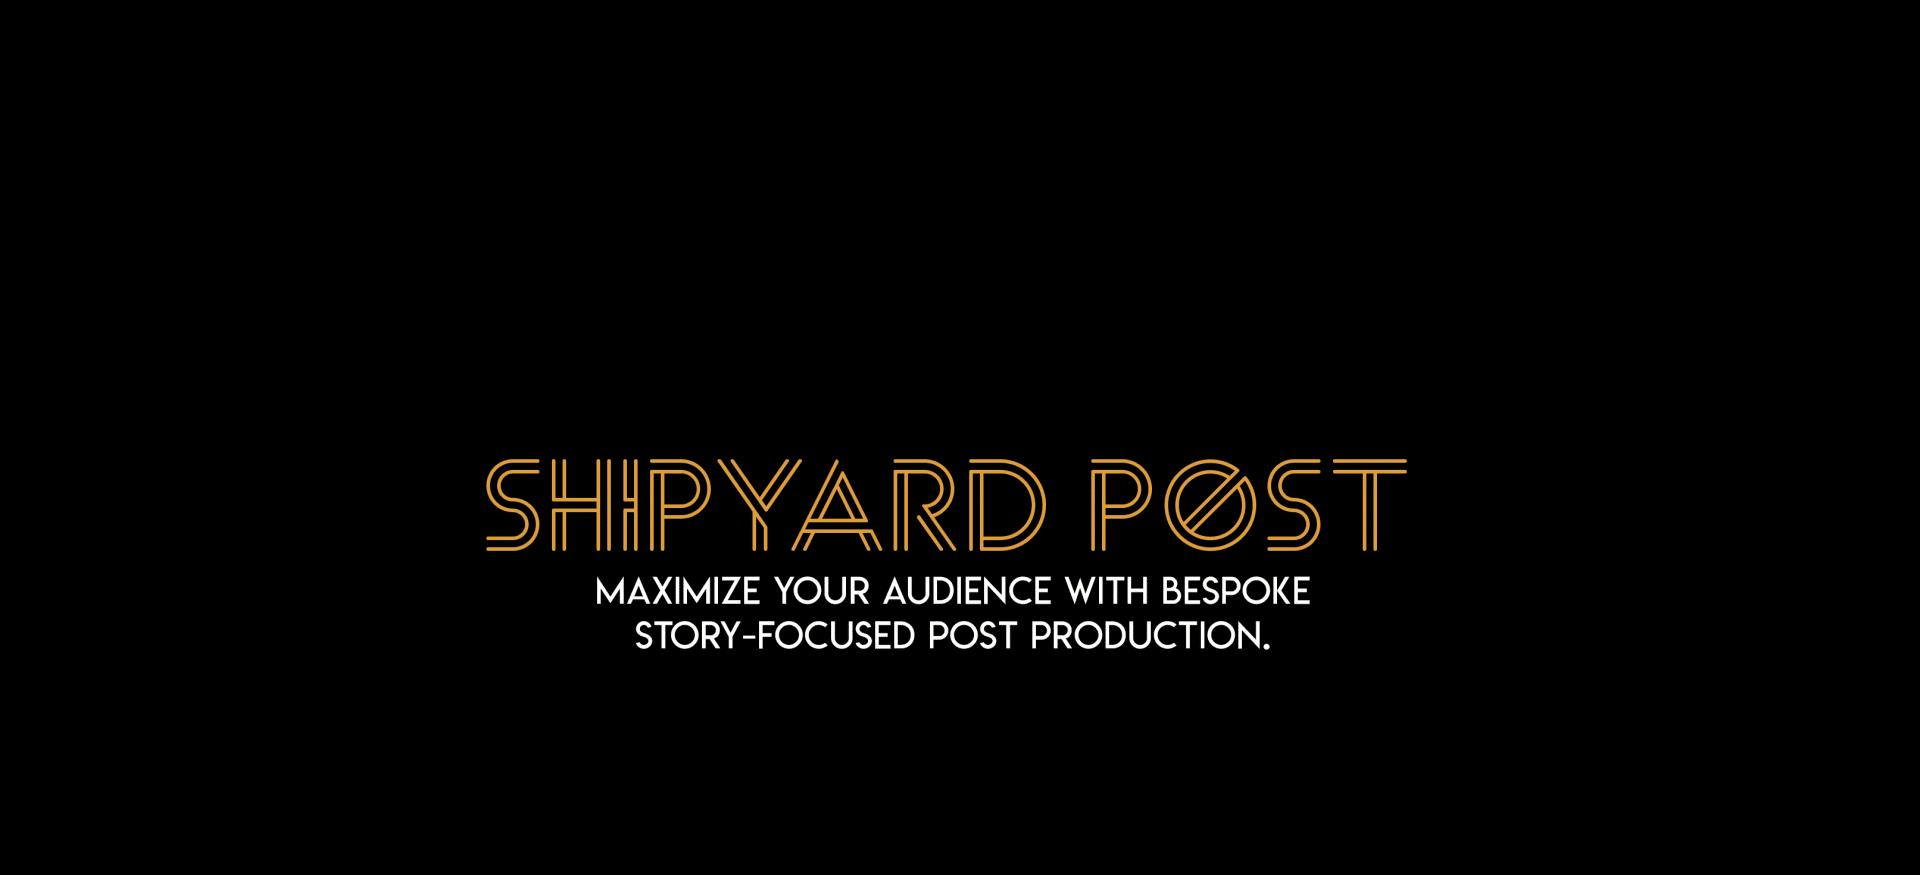 SHIPYARD POST